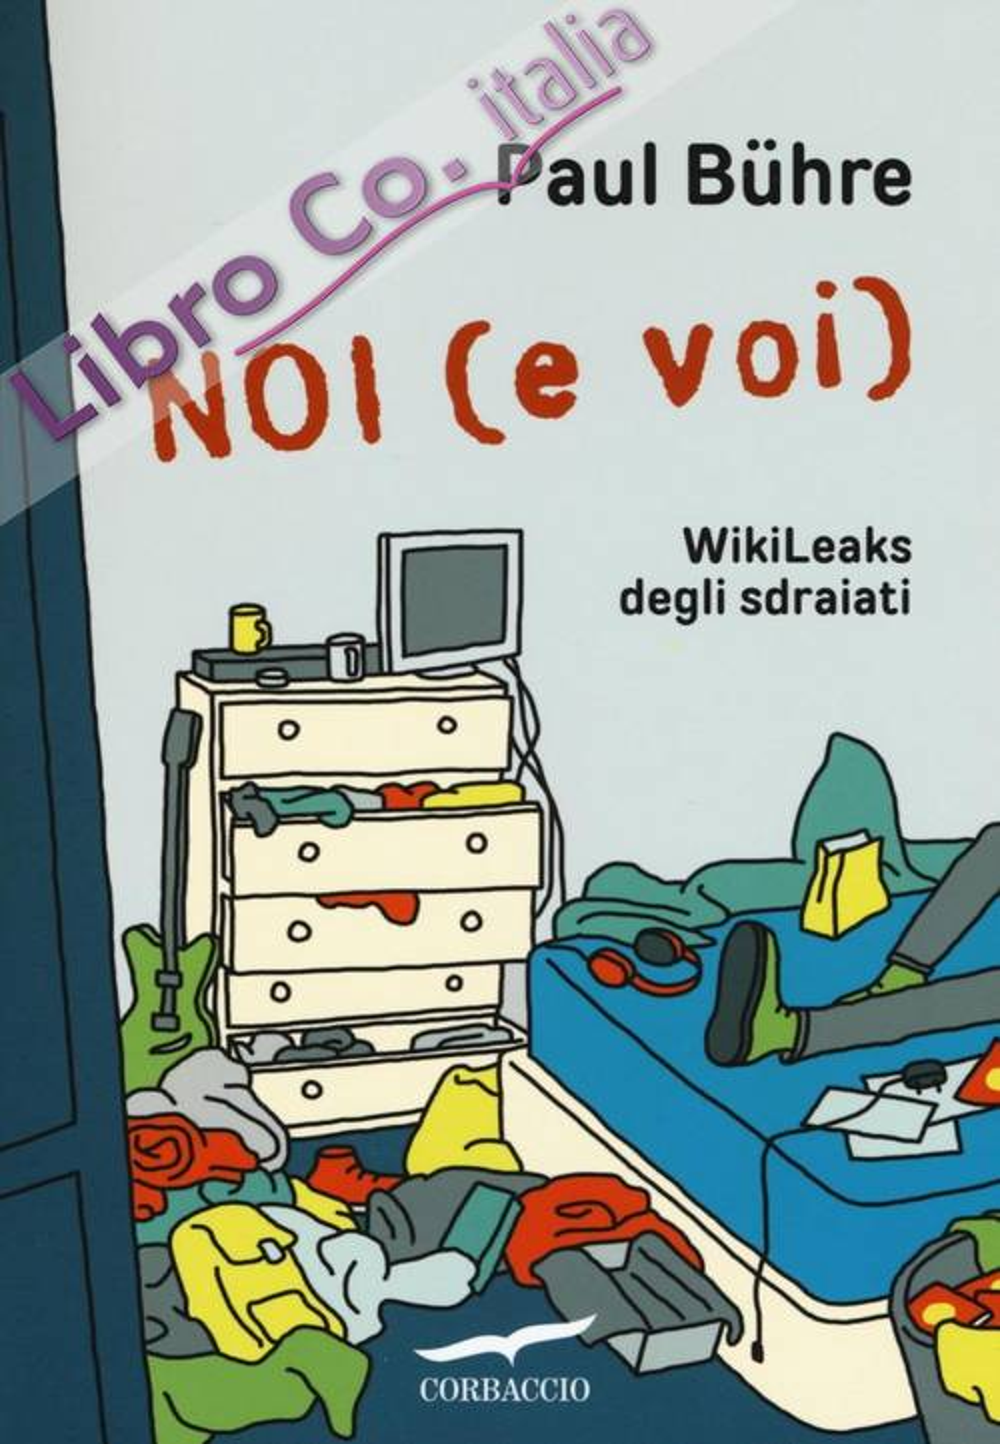 Noi (e voi). WikiLeaks degli sdraiati.